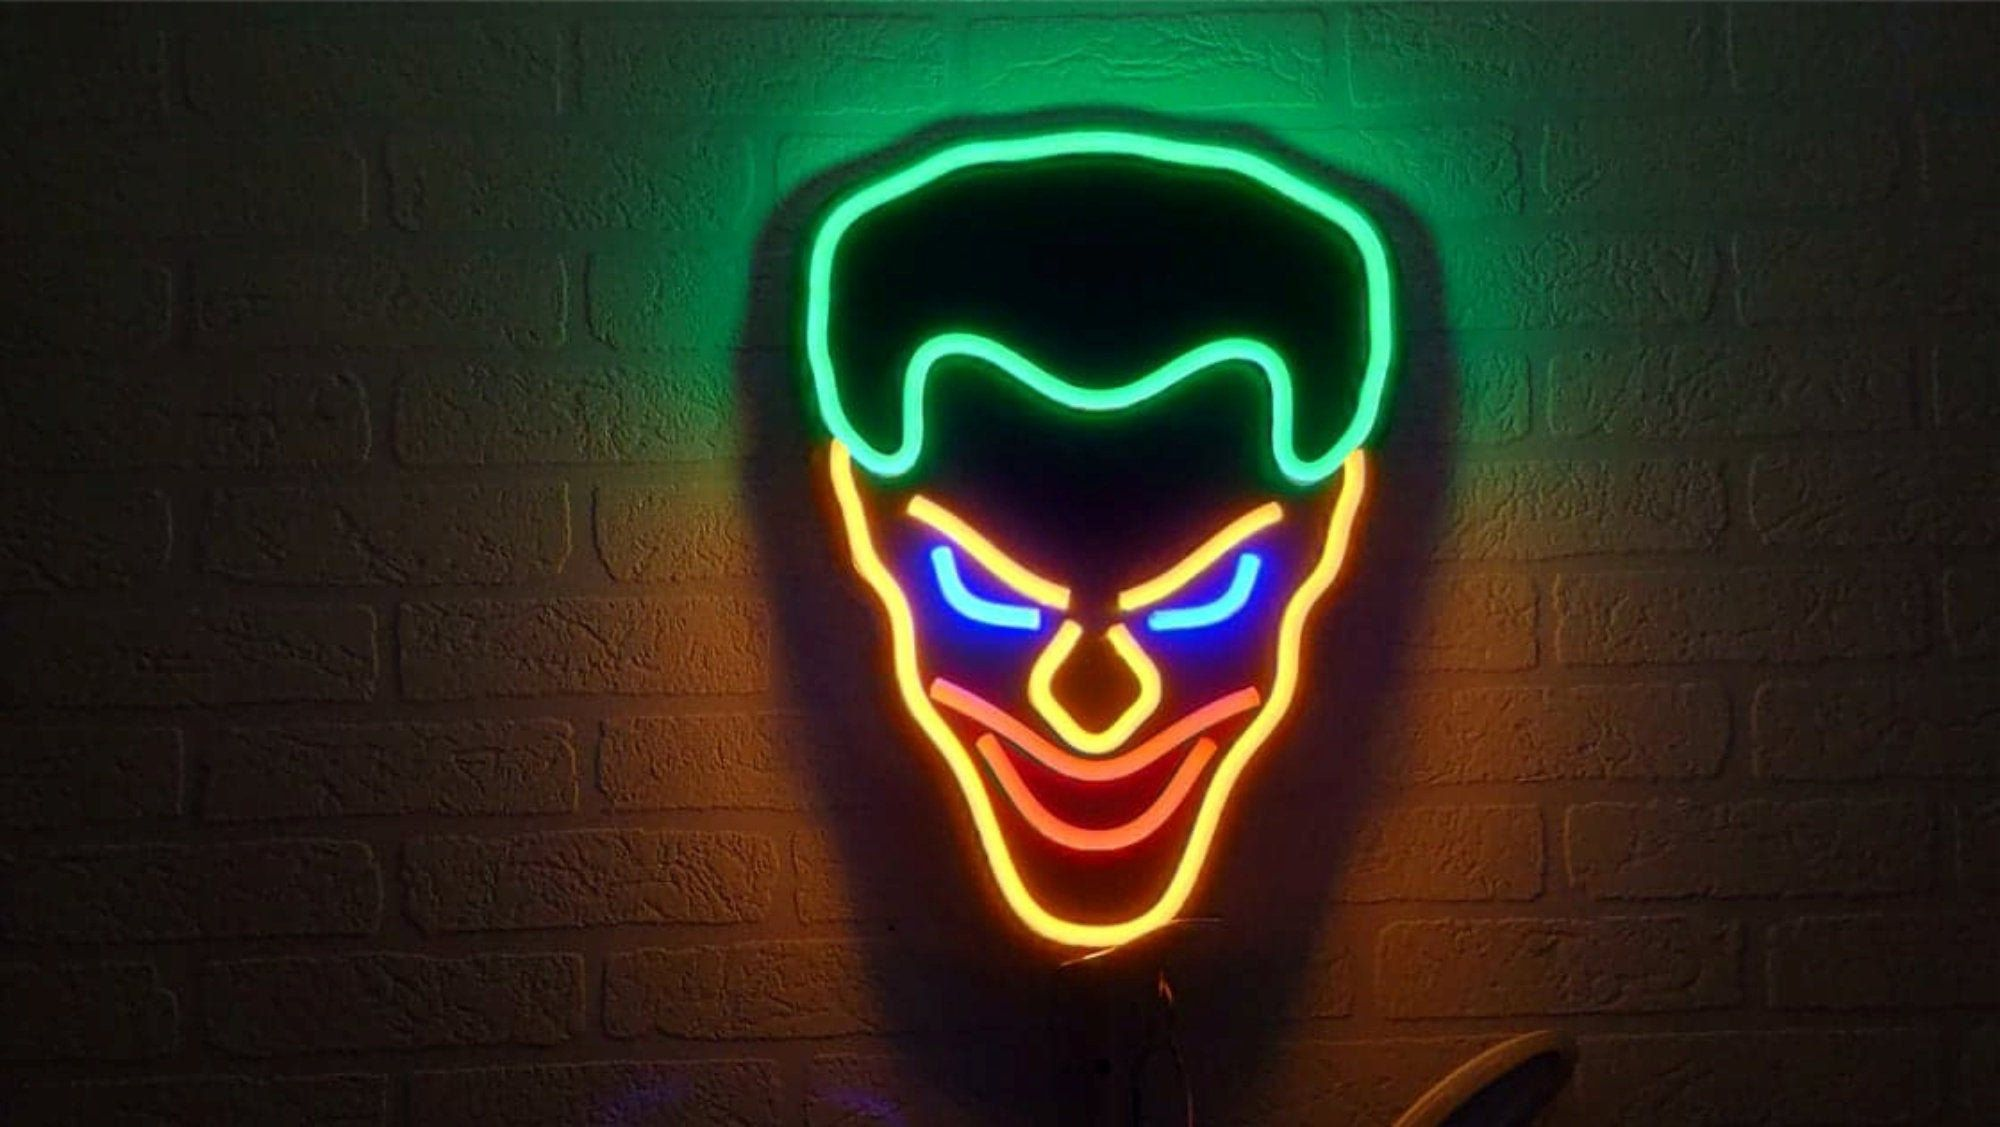 Joker Neon Sign Neon Decoration Custom Neon Decoration Ze Sklepu Neonworkshop Na Etsy Neon Signs Neon Decor Neon